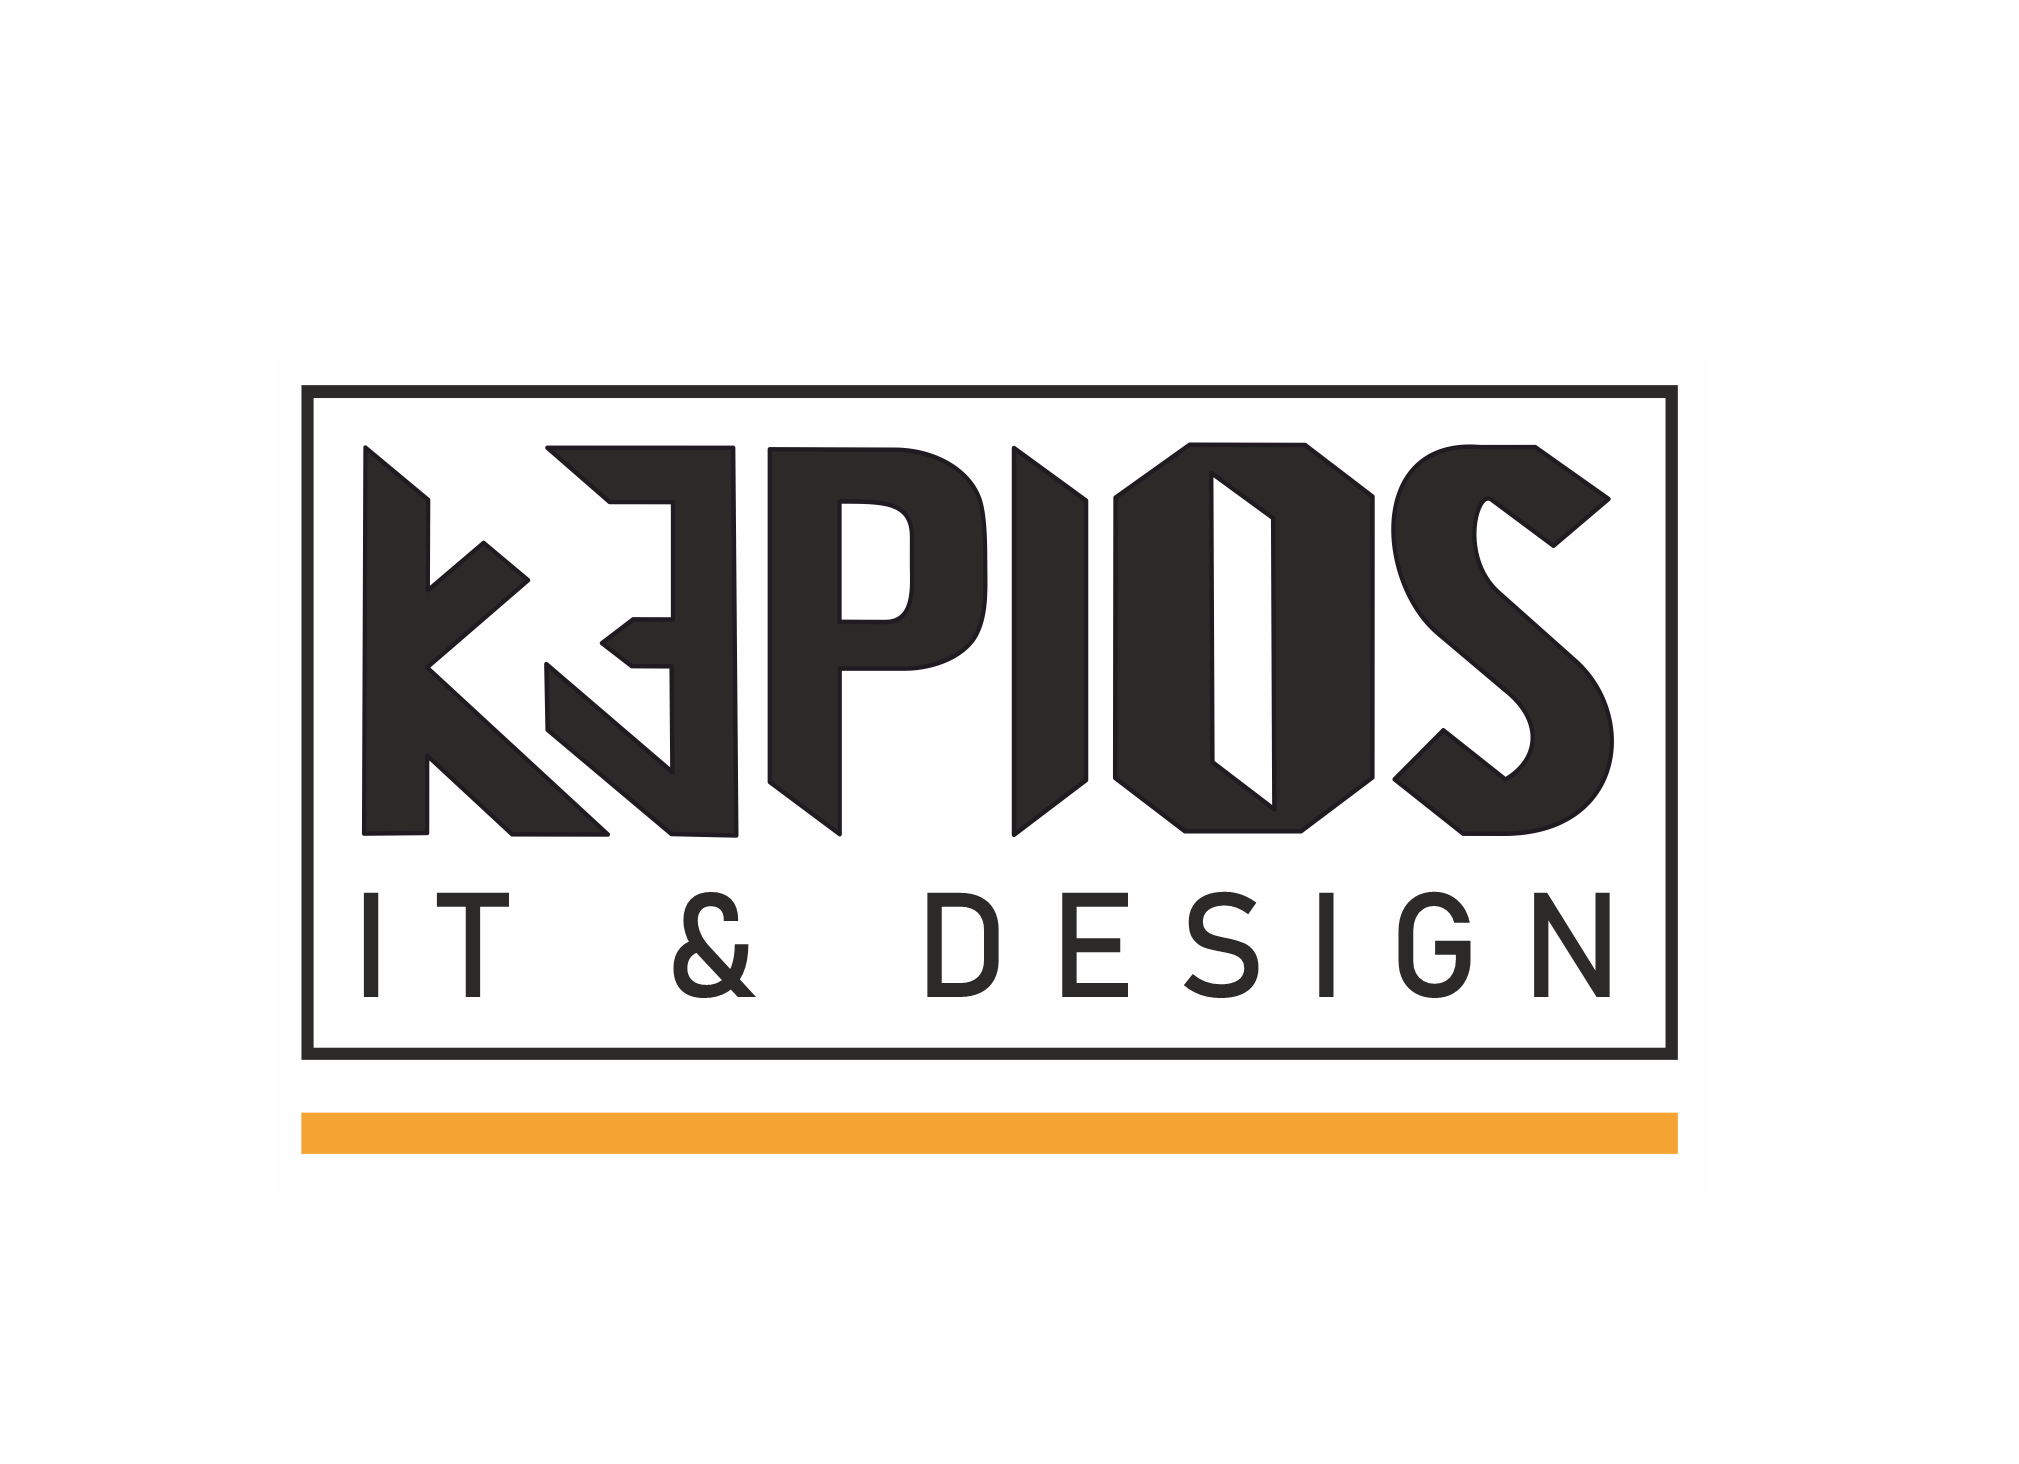 KEPIOS - IT & DESIGN in Barßel